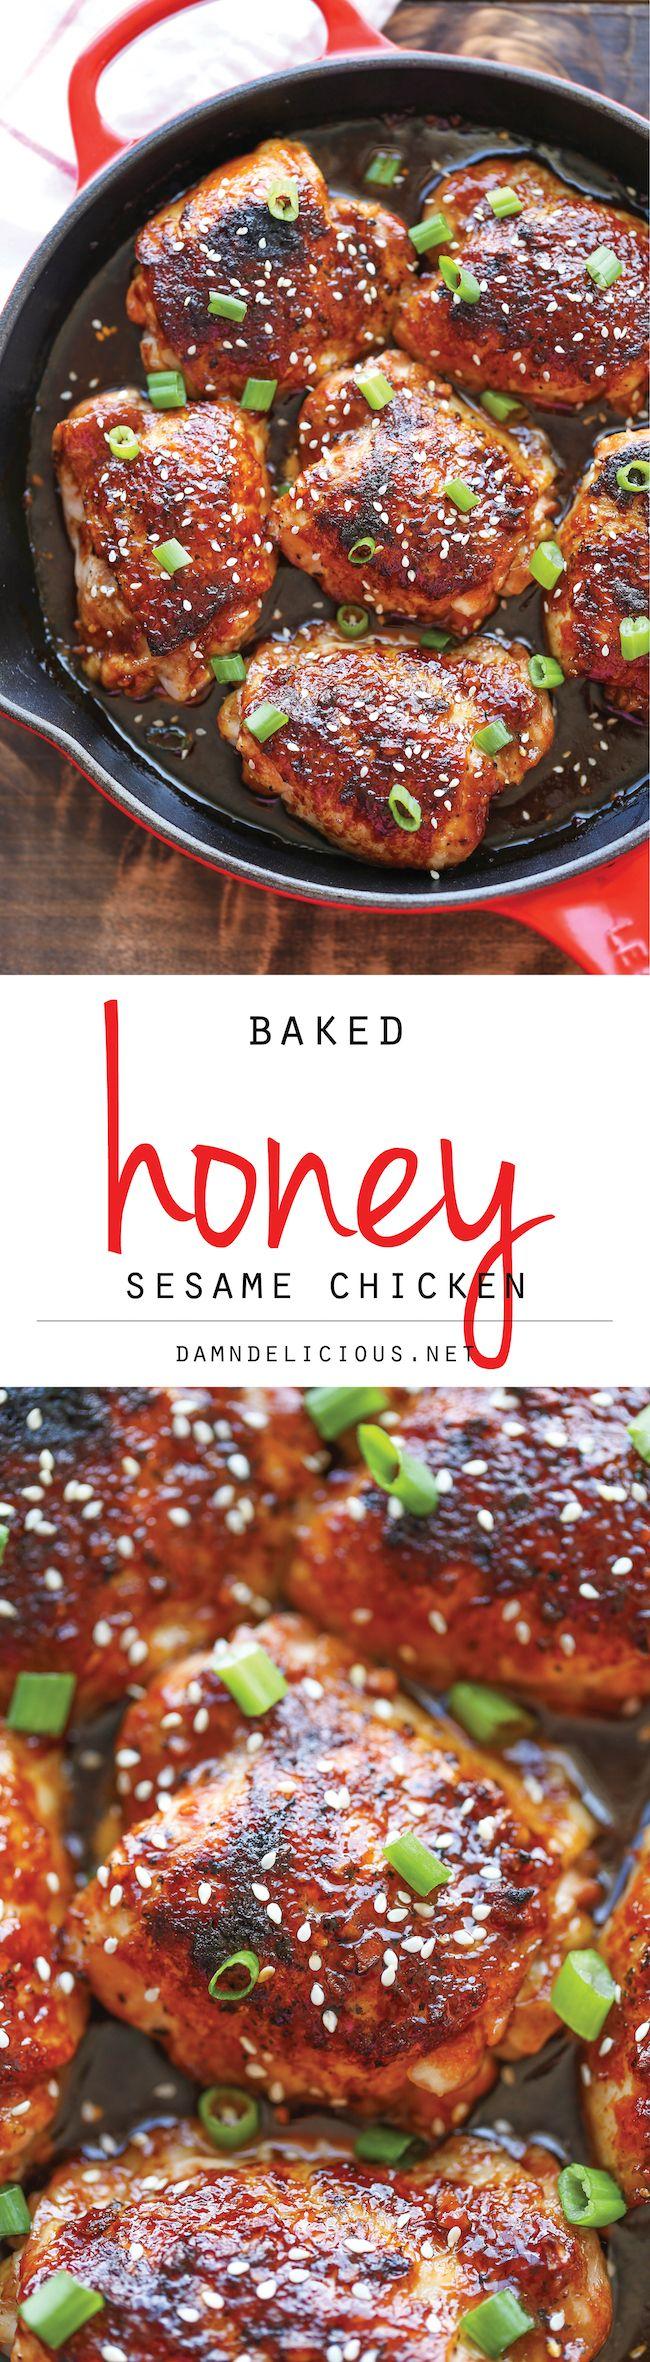 Honey Sesame Chicken ⭐️⭐️⭐️⭐️⭐️